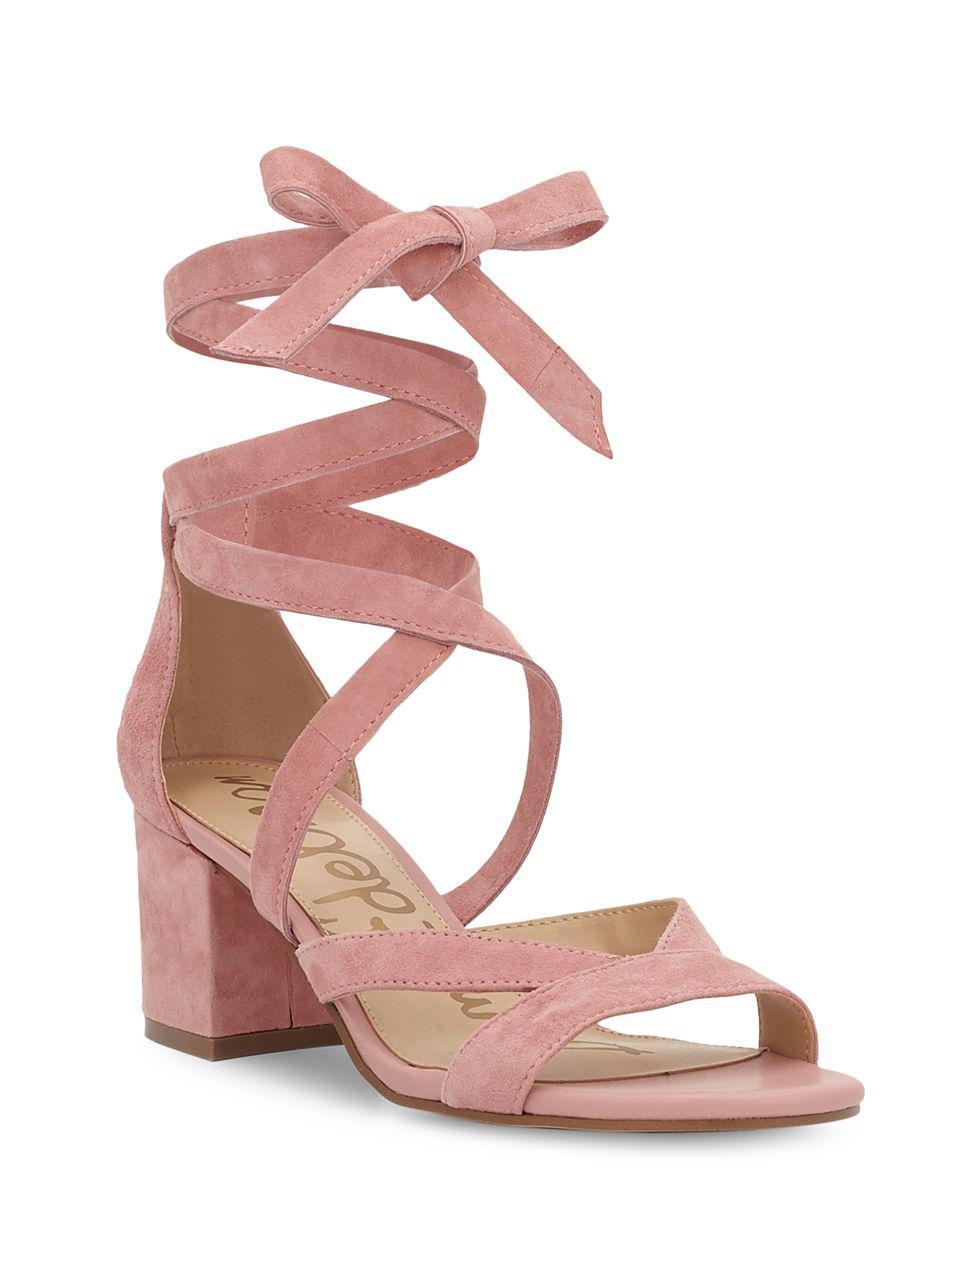 e4697fe8ca24 Lyst - Sam Edelman Sheri Suede Block Heel Sandals in Pink